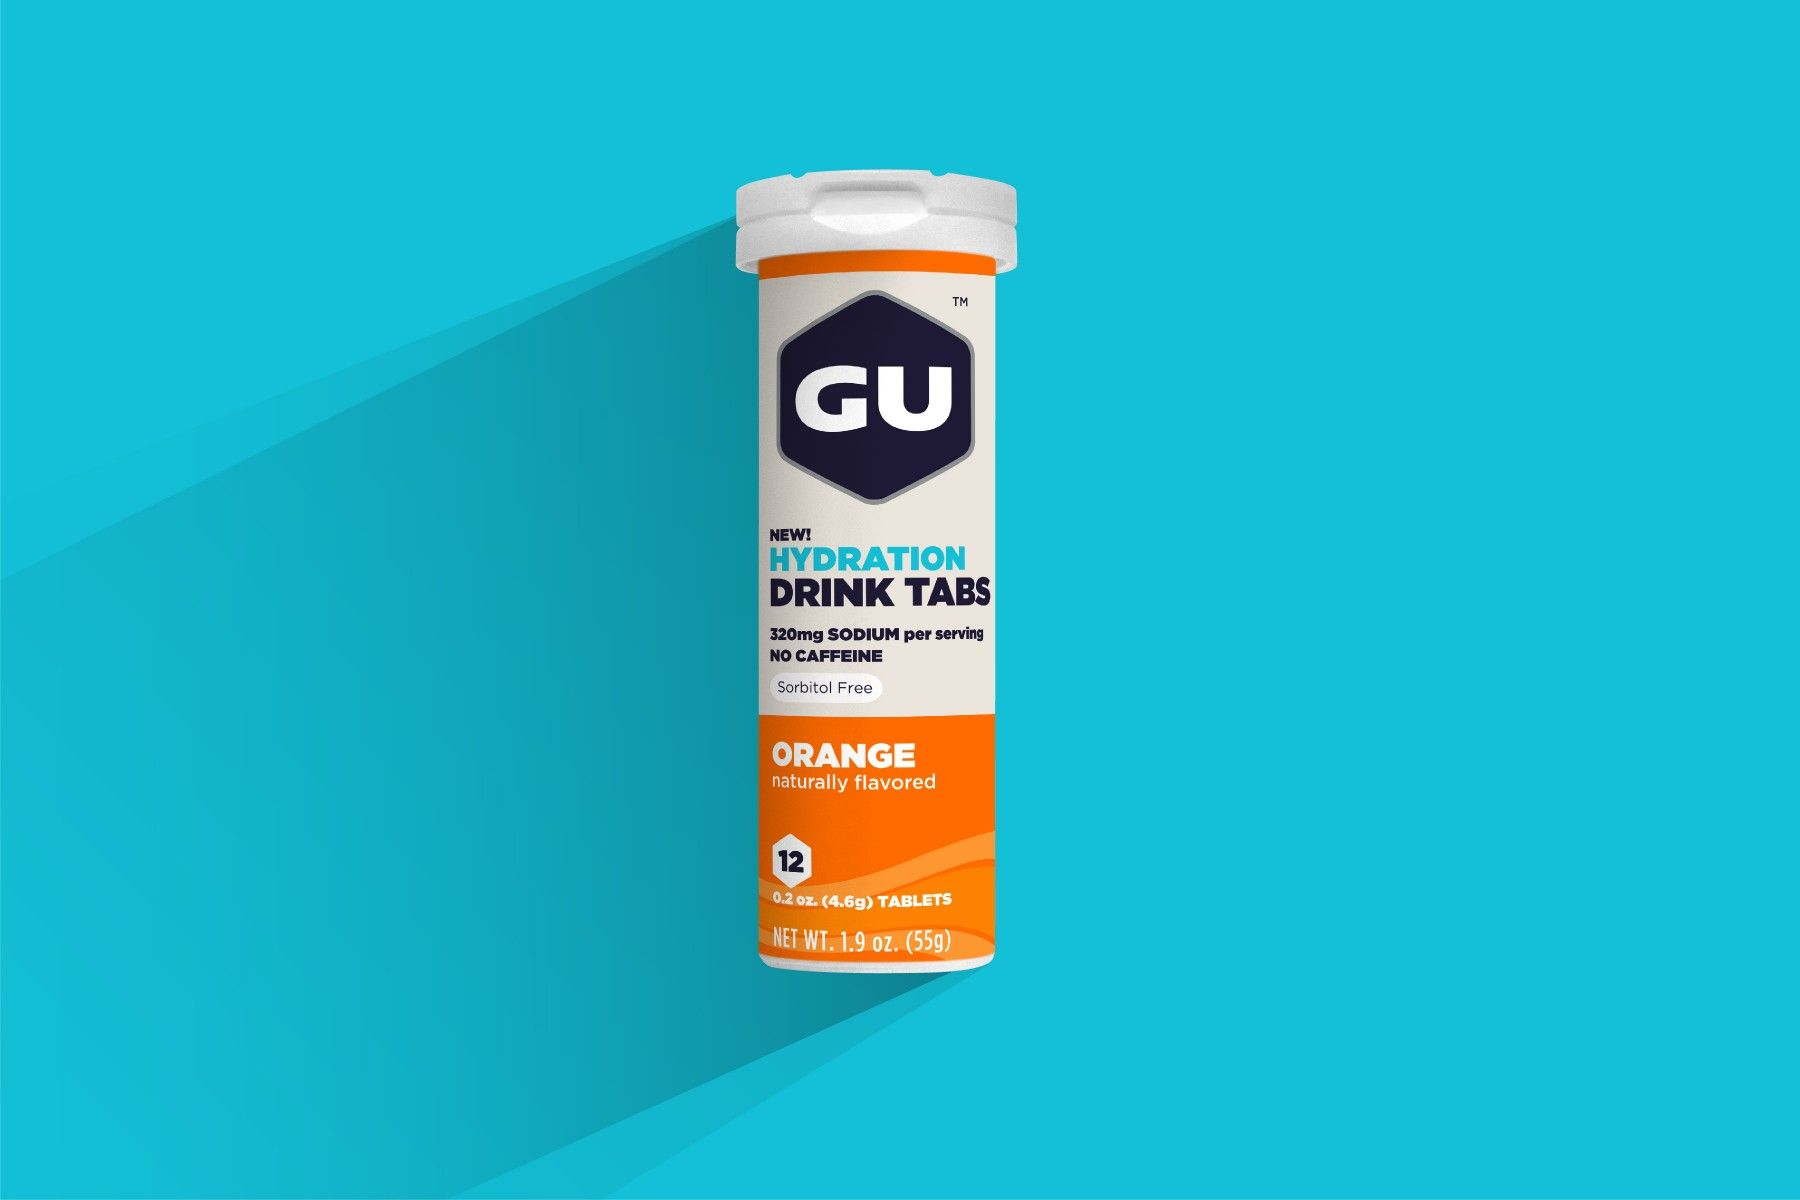 gu packaging - Google Search